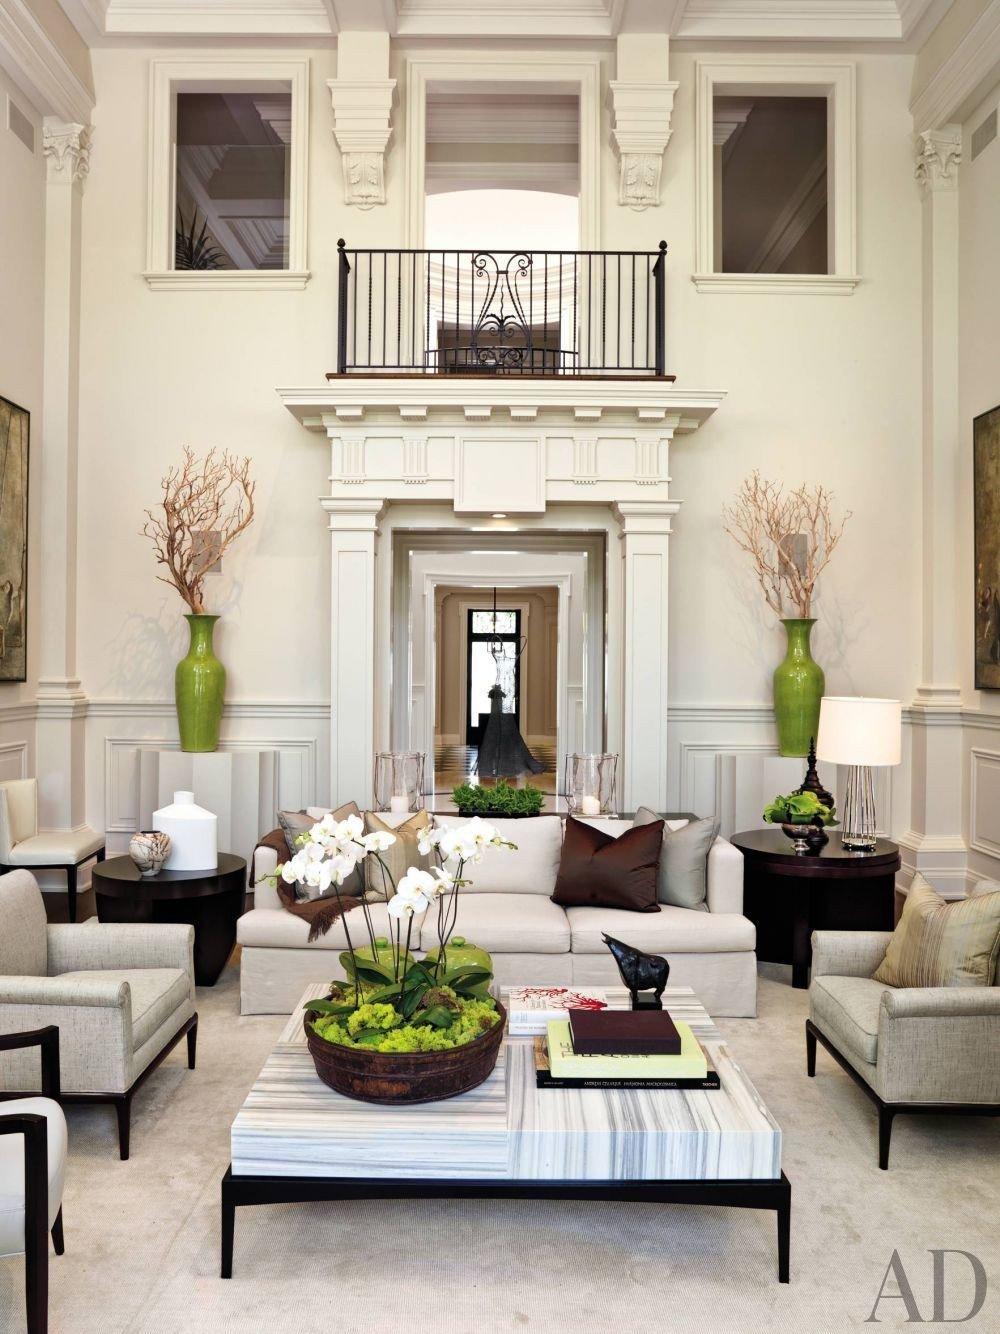 Elegant Contemporary Living Room Best Of Elegant Contemporary Living Room 19 Decoratoo